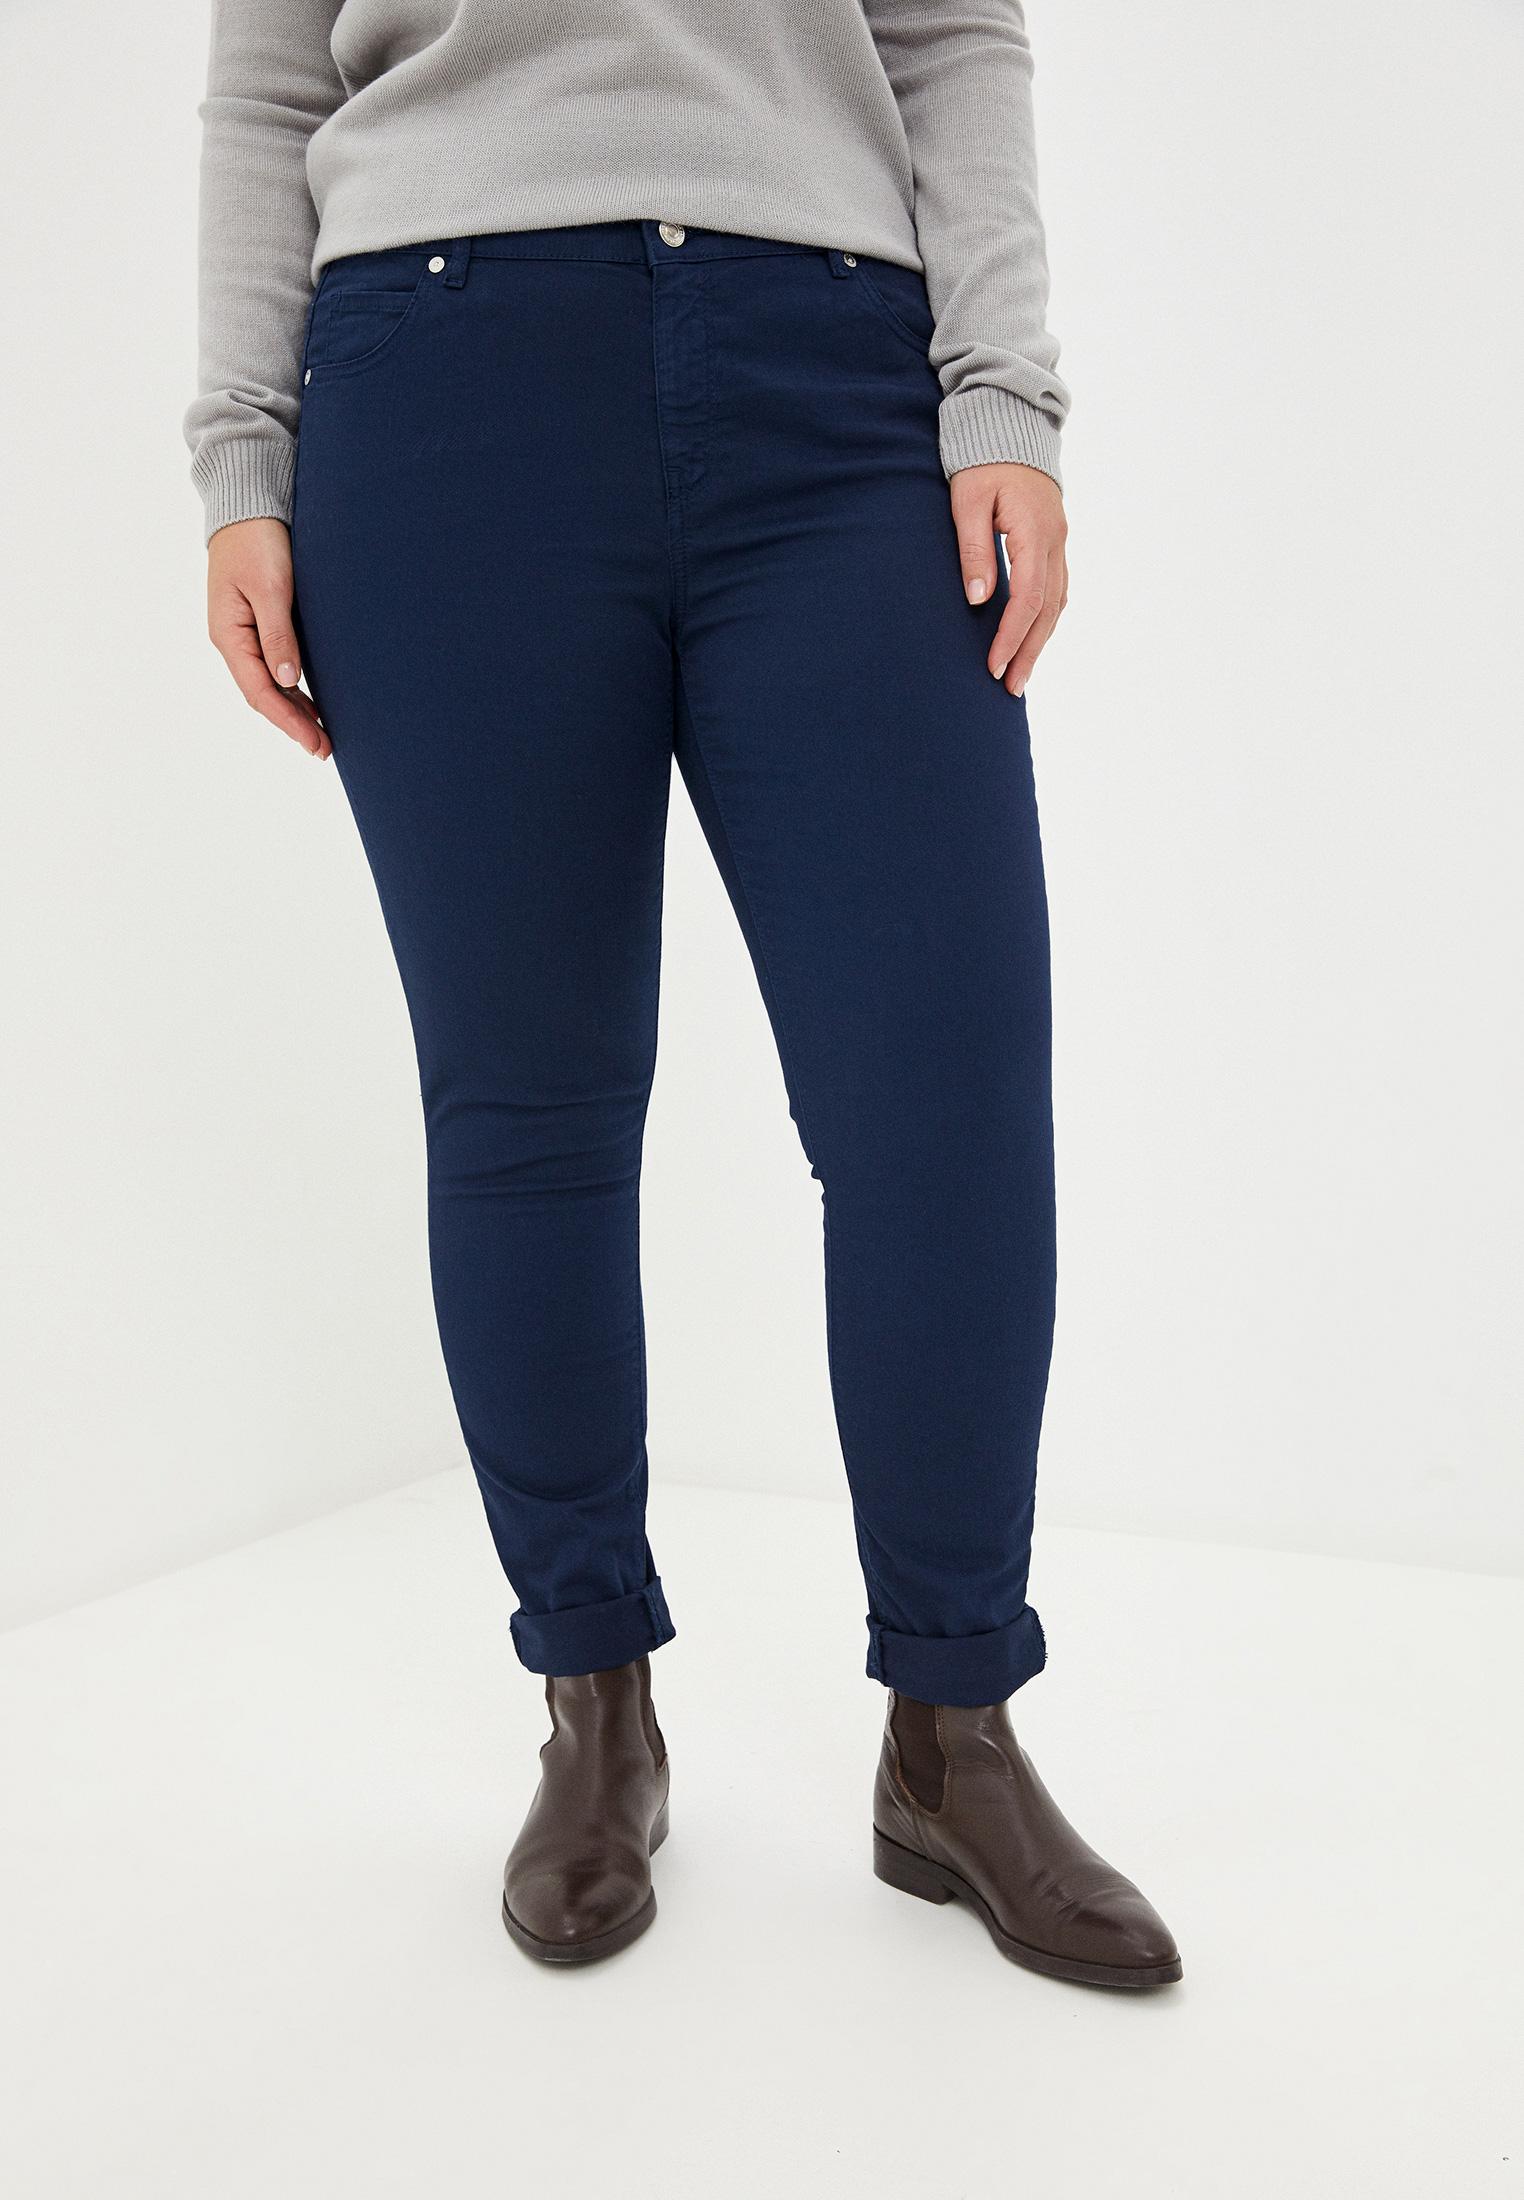 Женские зауженные брюки United Colors of Benetton (Юнайтед Колорс оф Бенеттон) 4GD7574K3